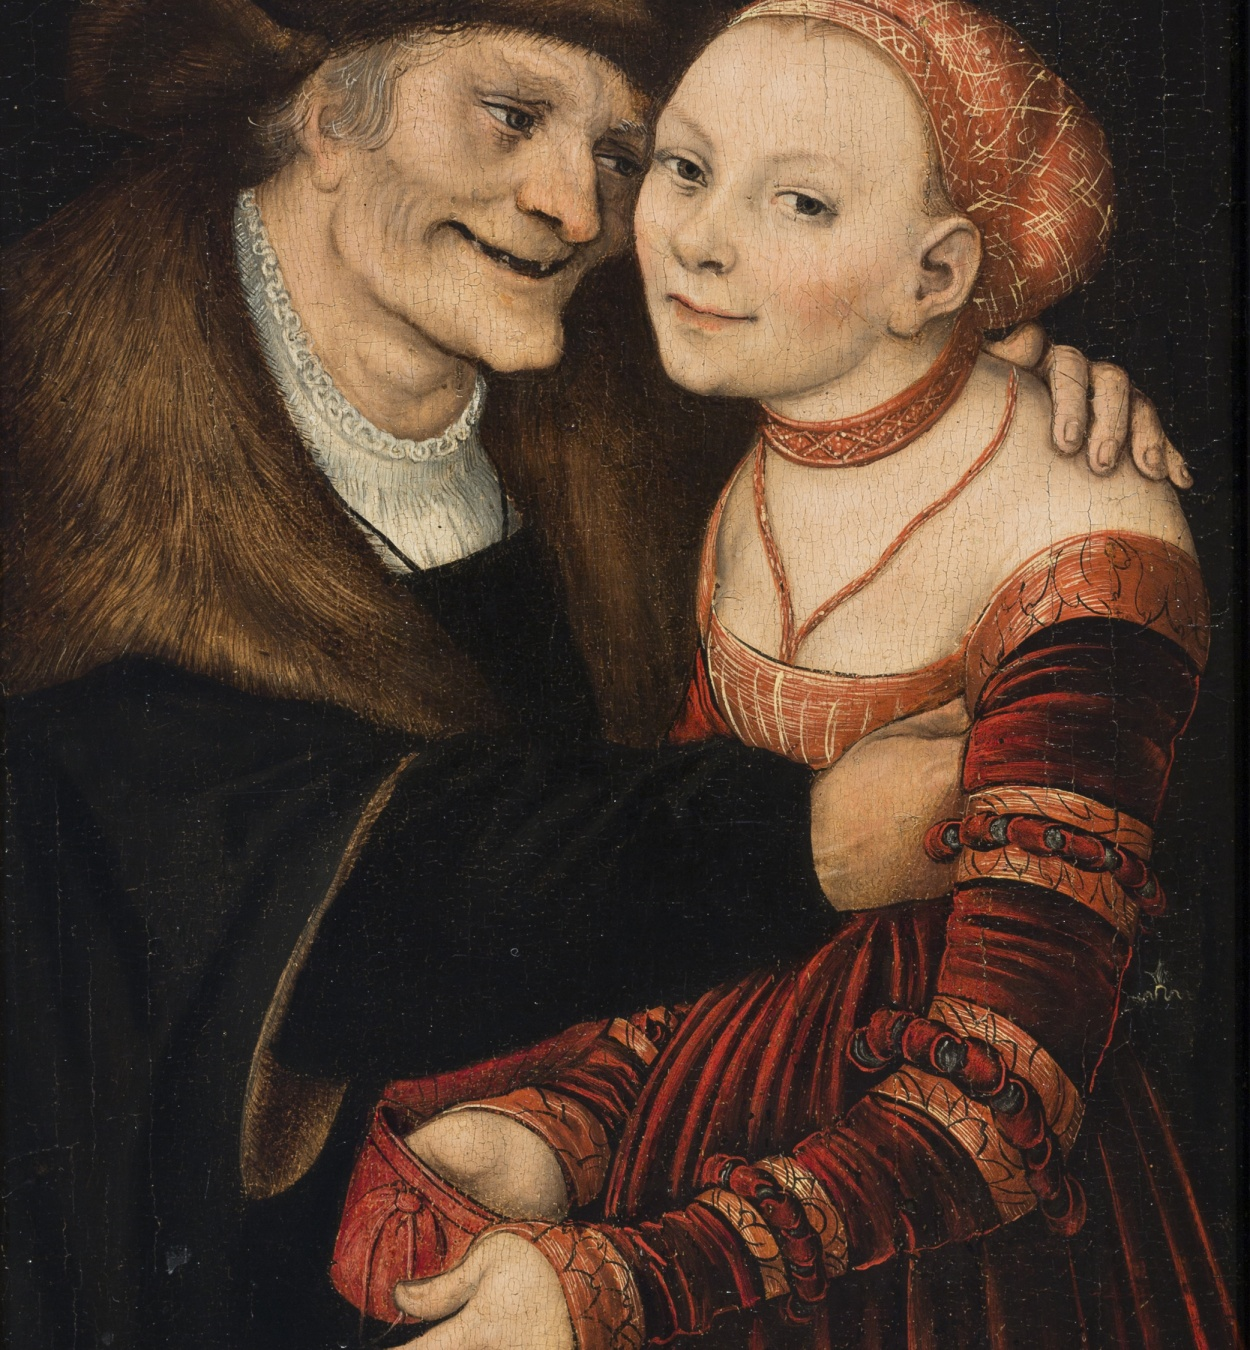 Lucas Cranach (el Vell) - Parella amorosa desigual - 1517